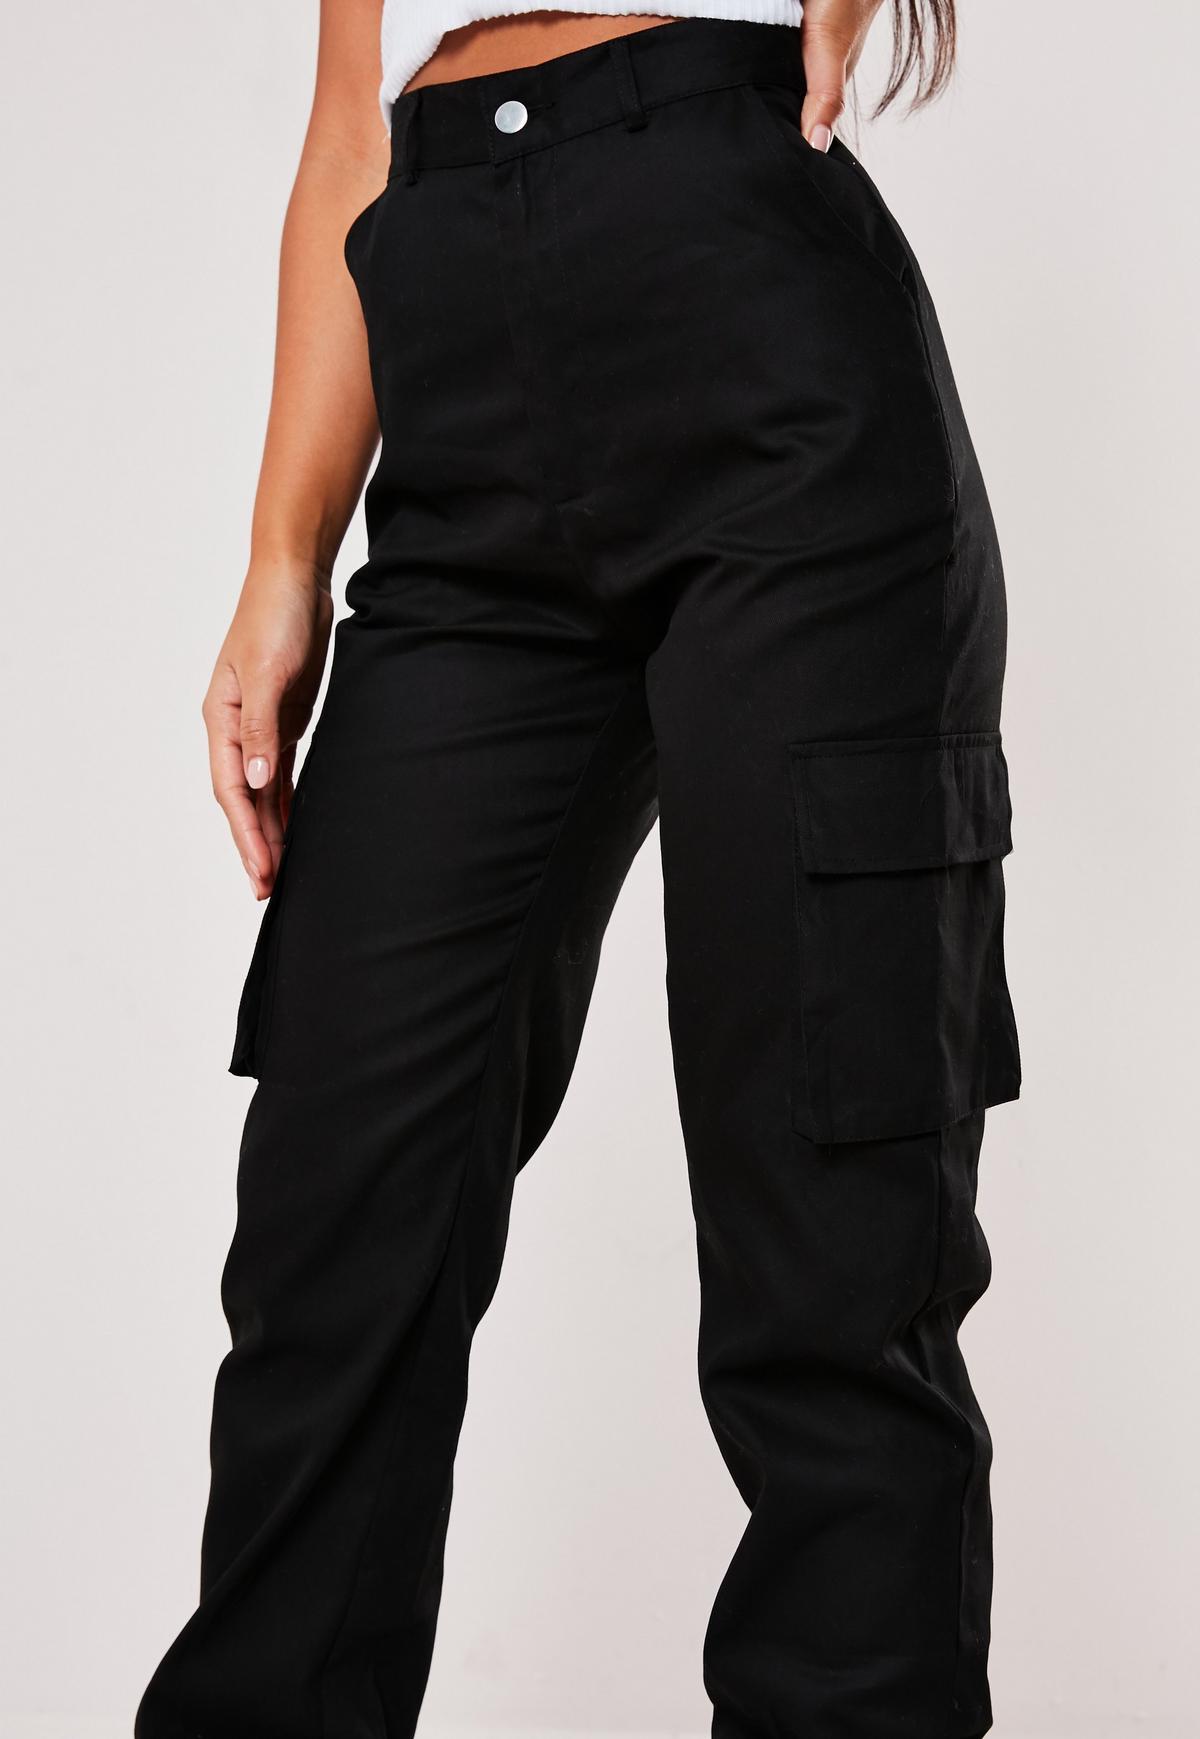 Petite Black Plain Cargo Trousers Missguided Australia